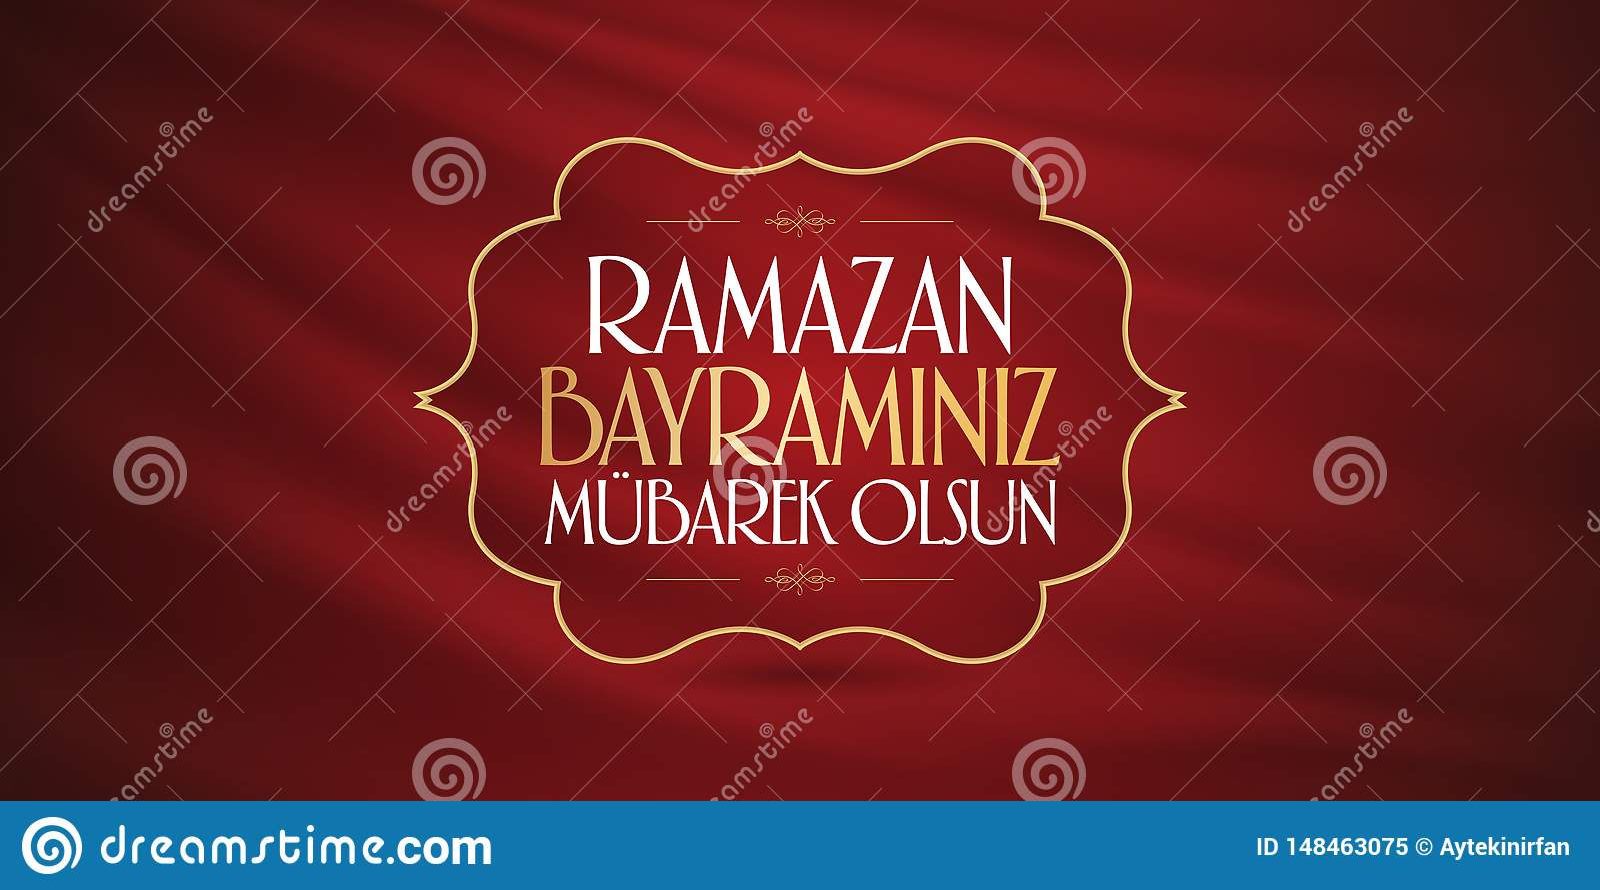 Cumprimentos de Eid al-Fitr Mubarak Islamic Feast turcos: M?s de Ramazan Bayraminiz Mubarek Olsun Holy da comunidade mu?ulmana Ra